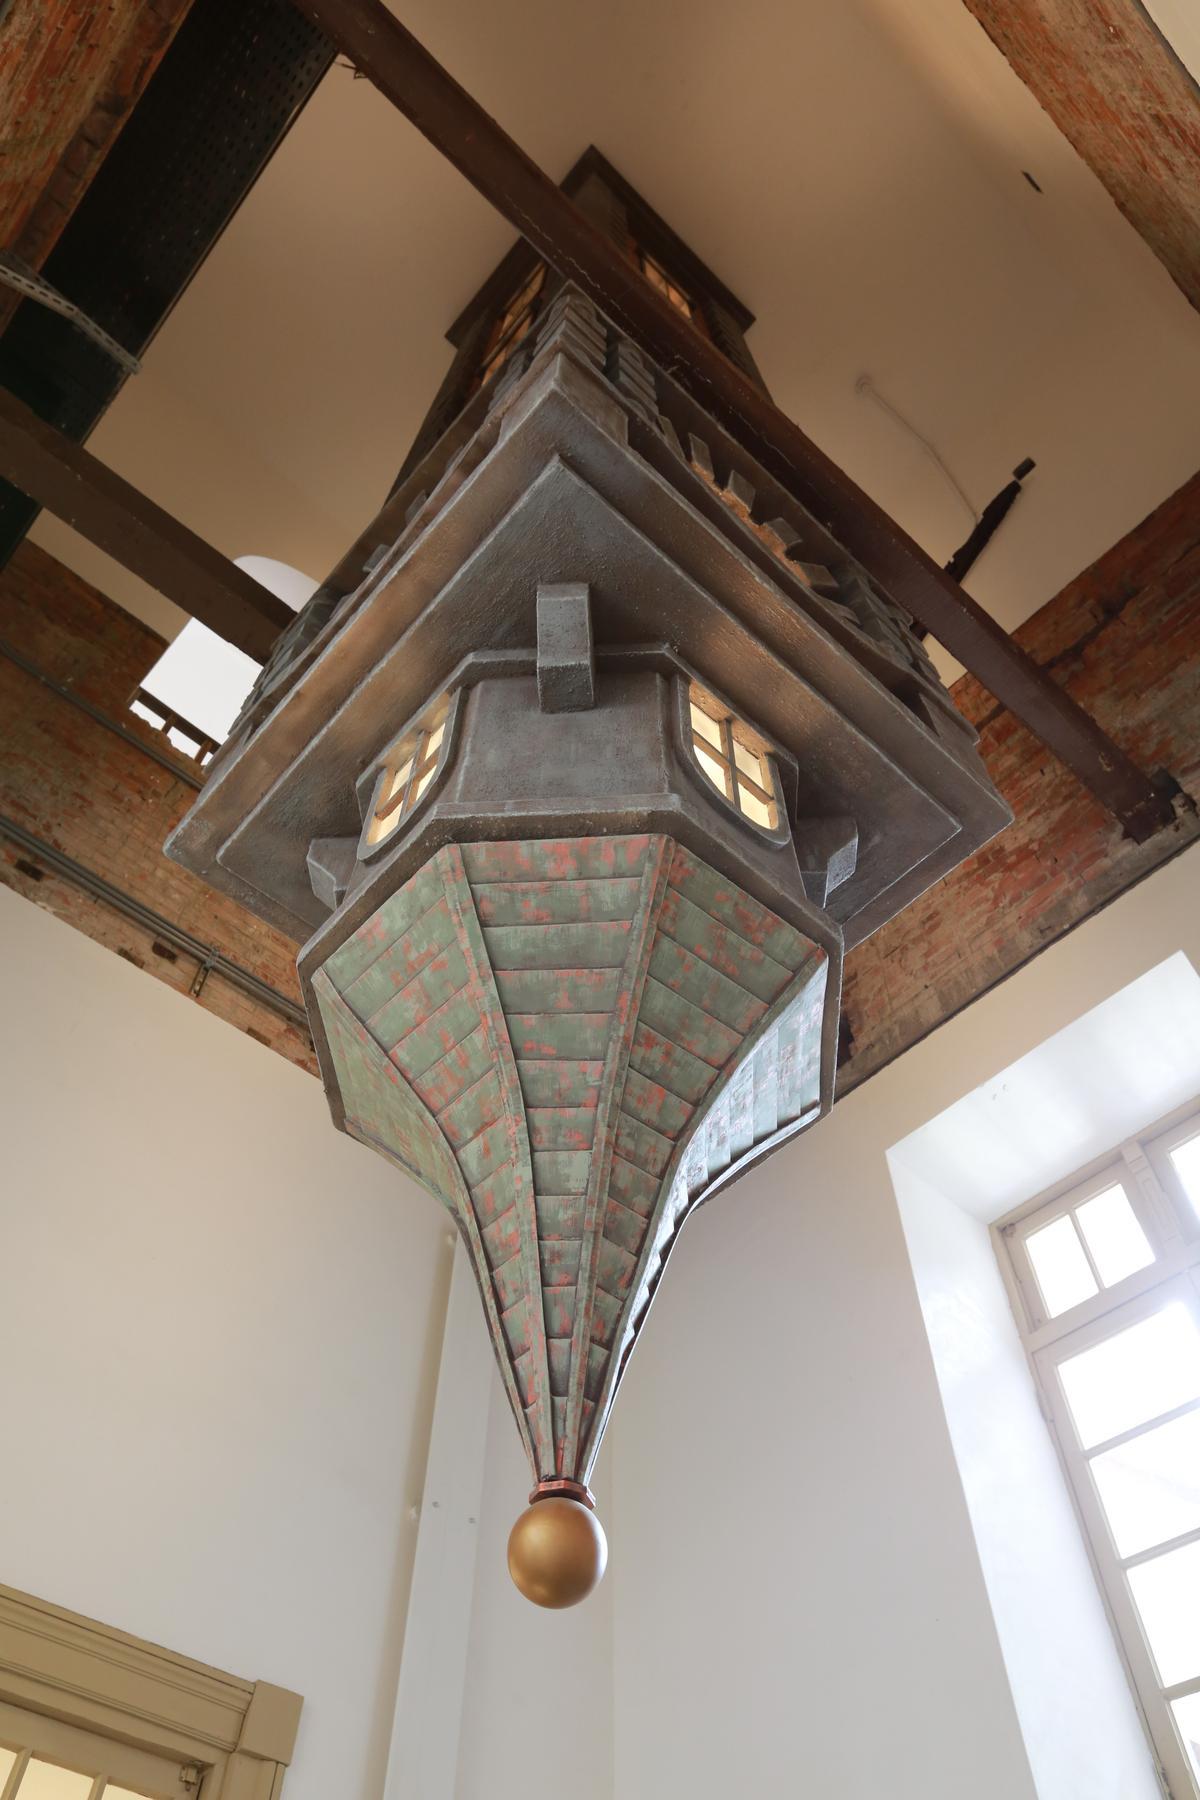 「天塔Disappear Tower」上下倒置,當代藝術手法令人玩味。